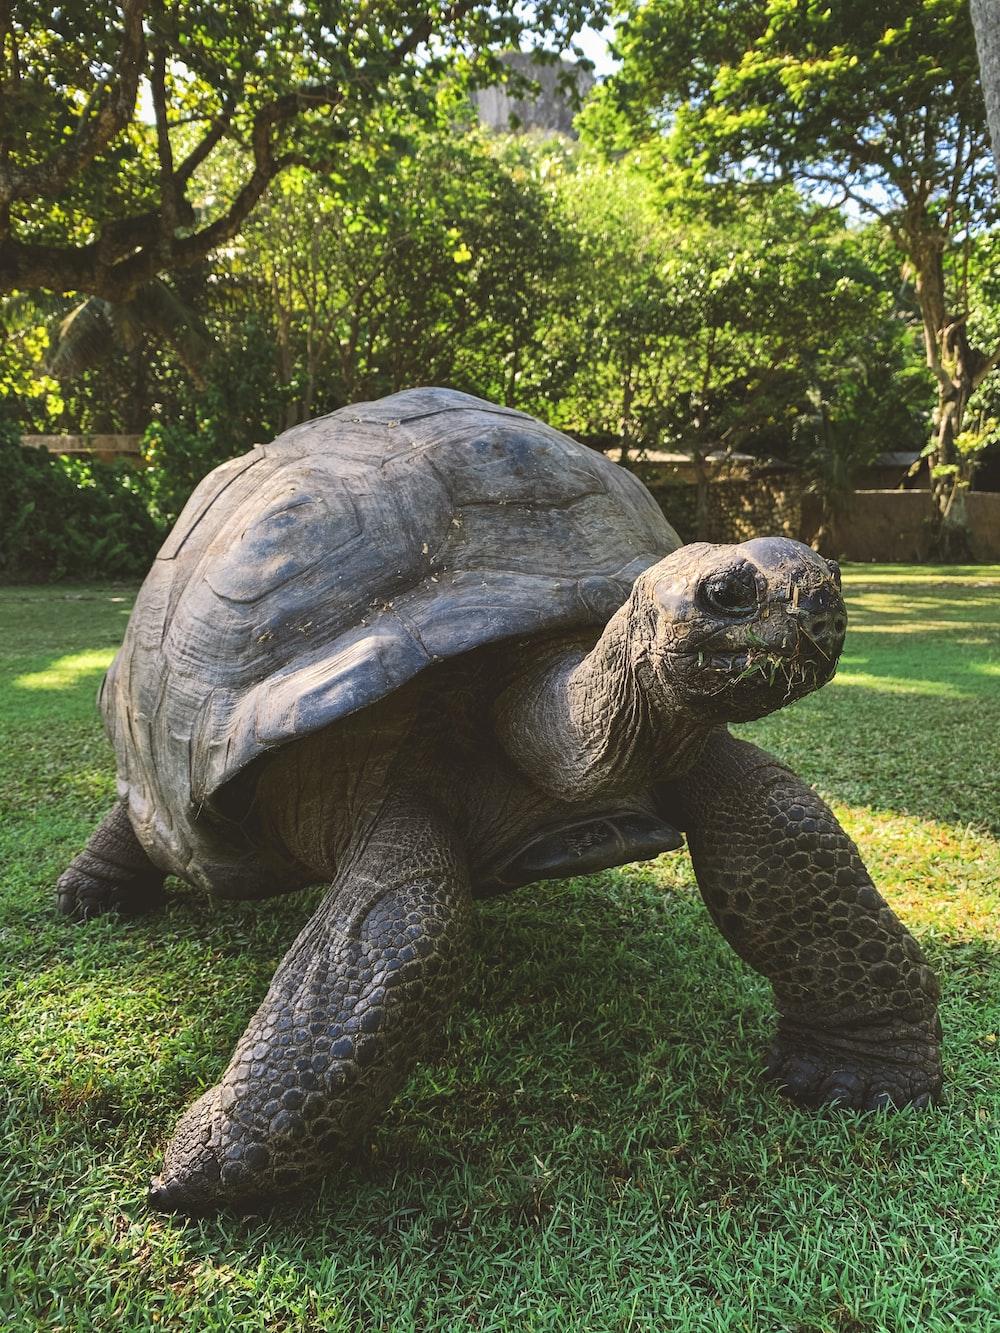 brown tortoise walking in grass